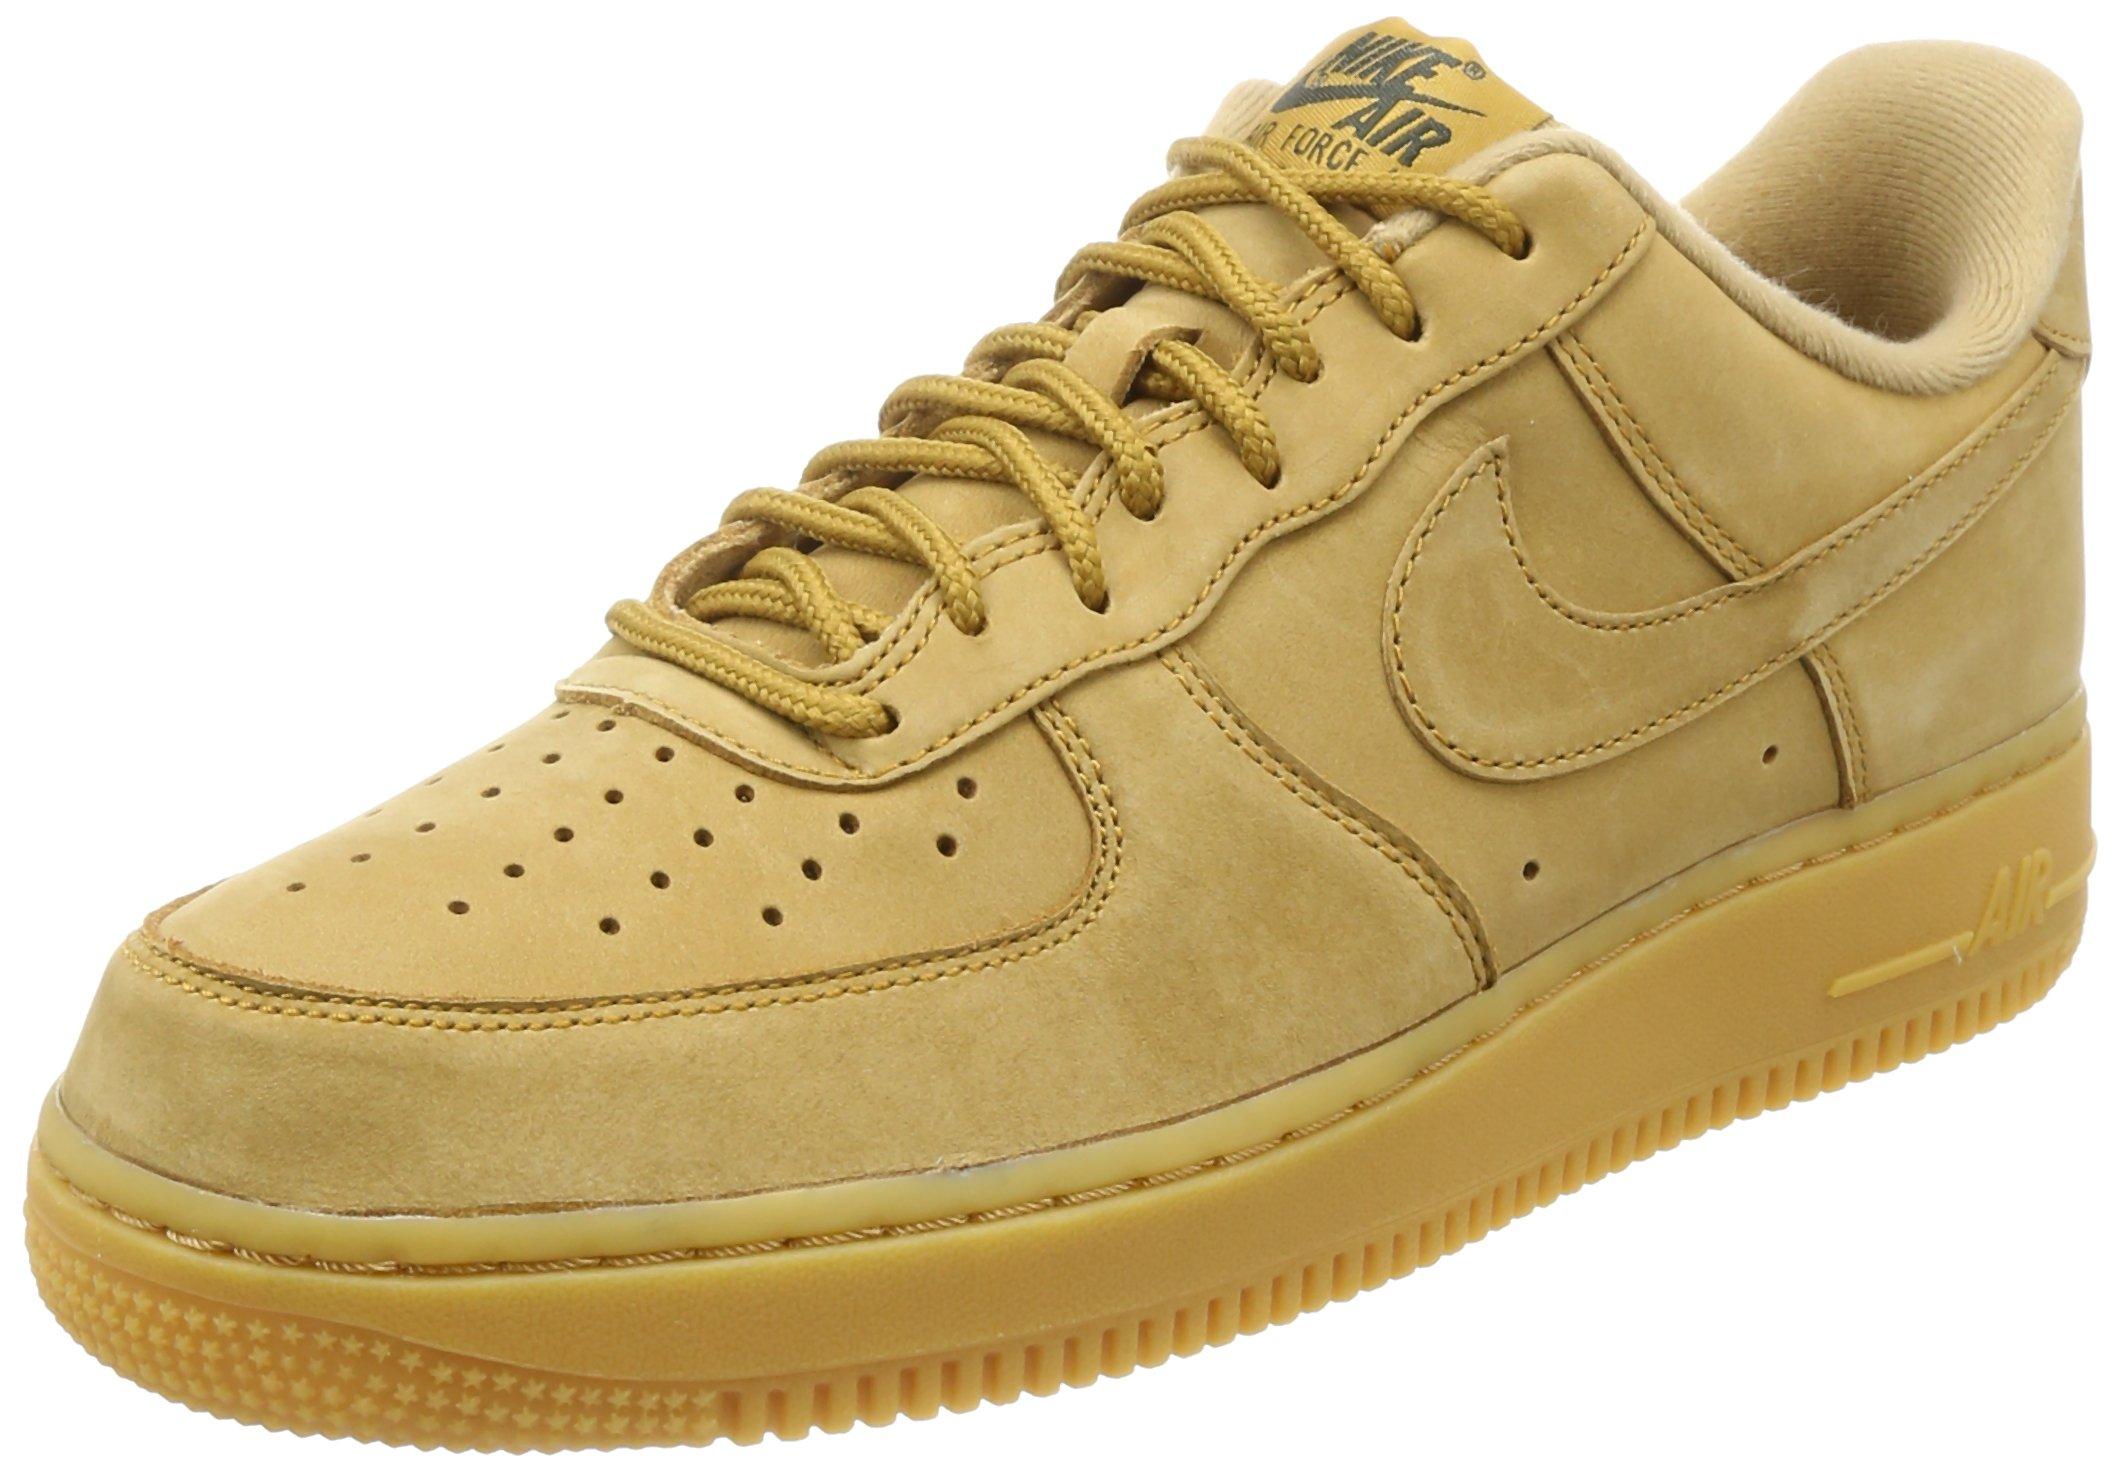 Nike Mens Air Force 1 '07 WB Basketball Shoes (9.5)